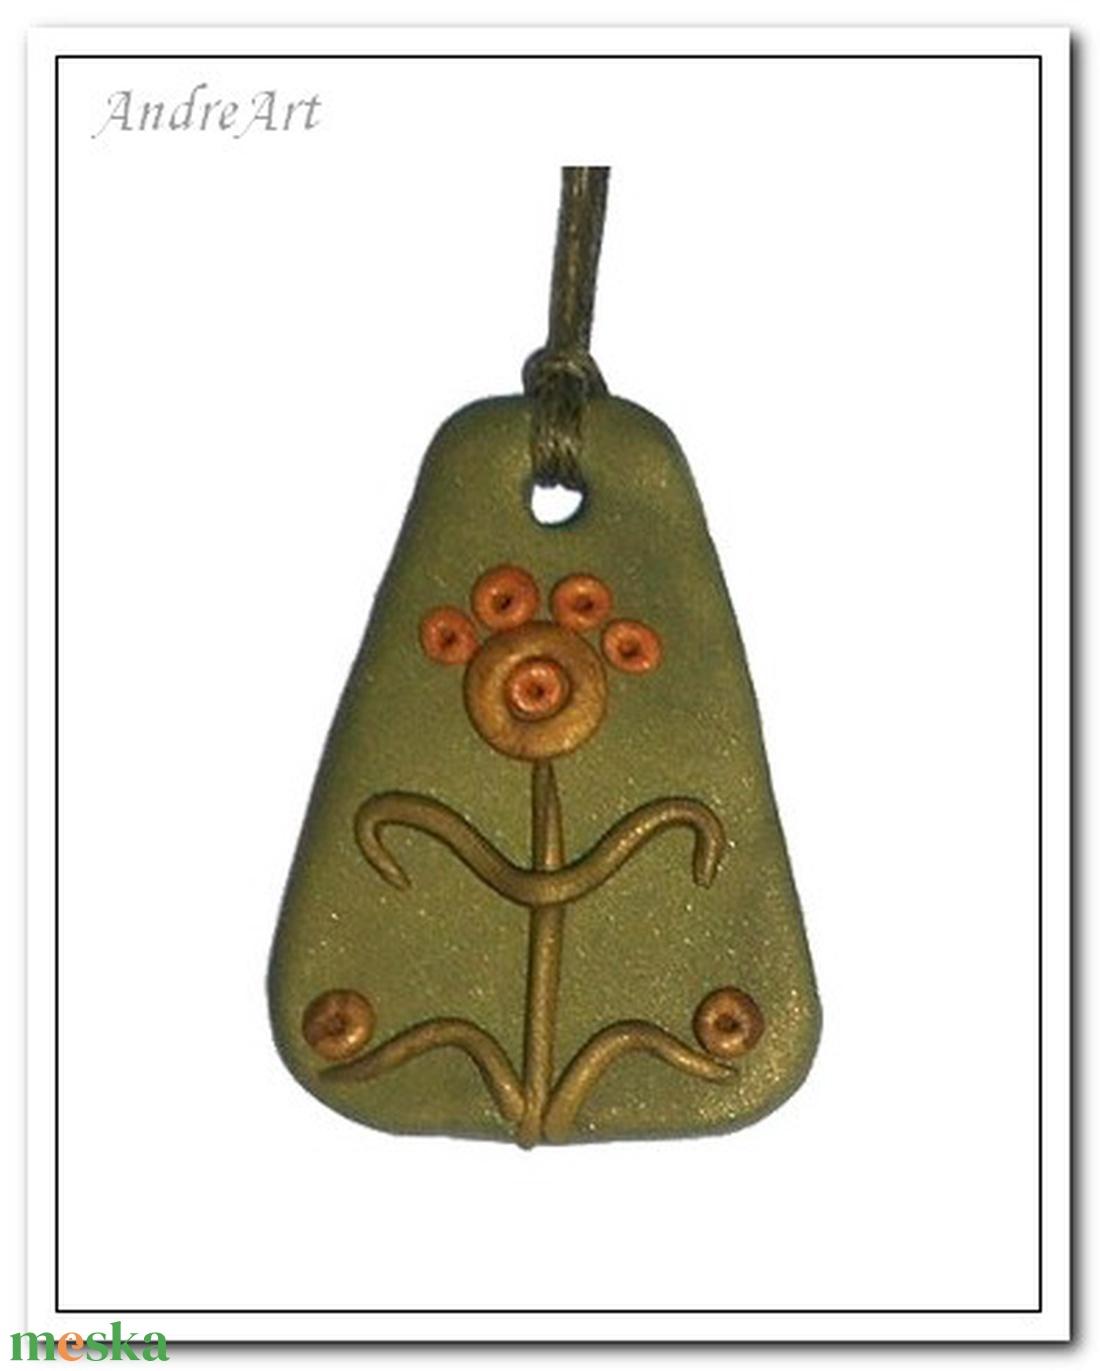 Zöld- arany virágalakos medál (andreart) - Meska.hu